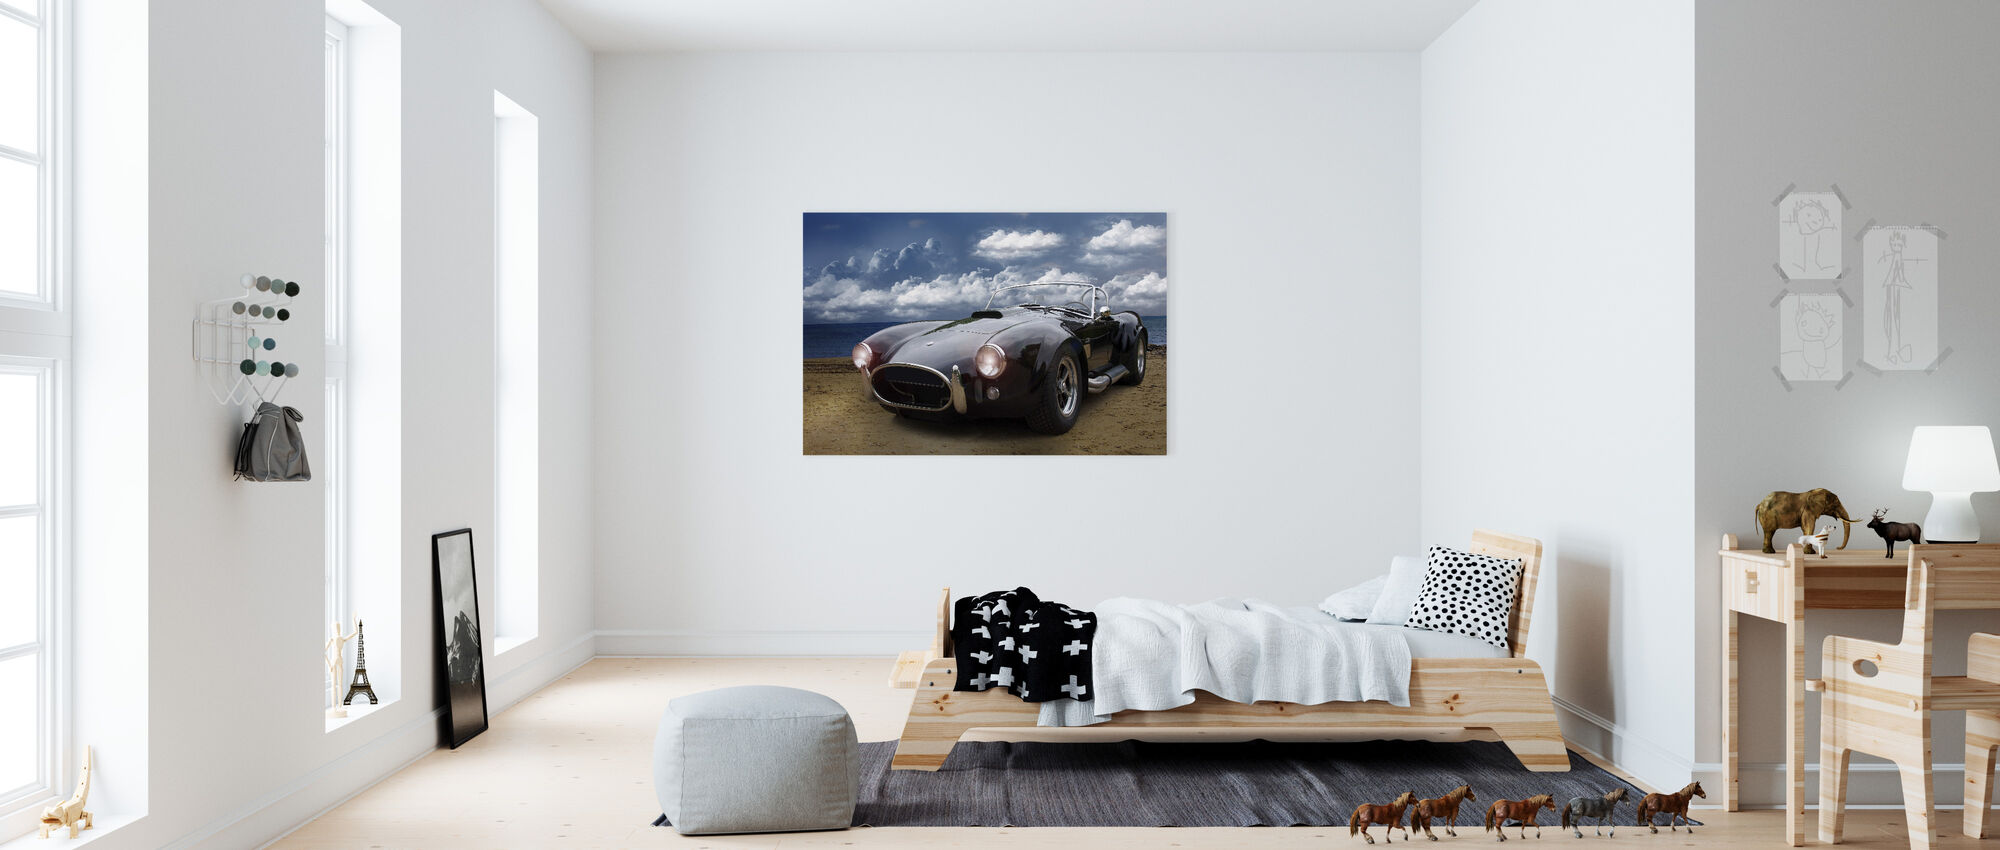 Classic Vintage Car - Canvas print - Kids Room